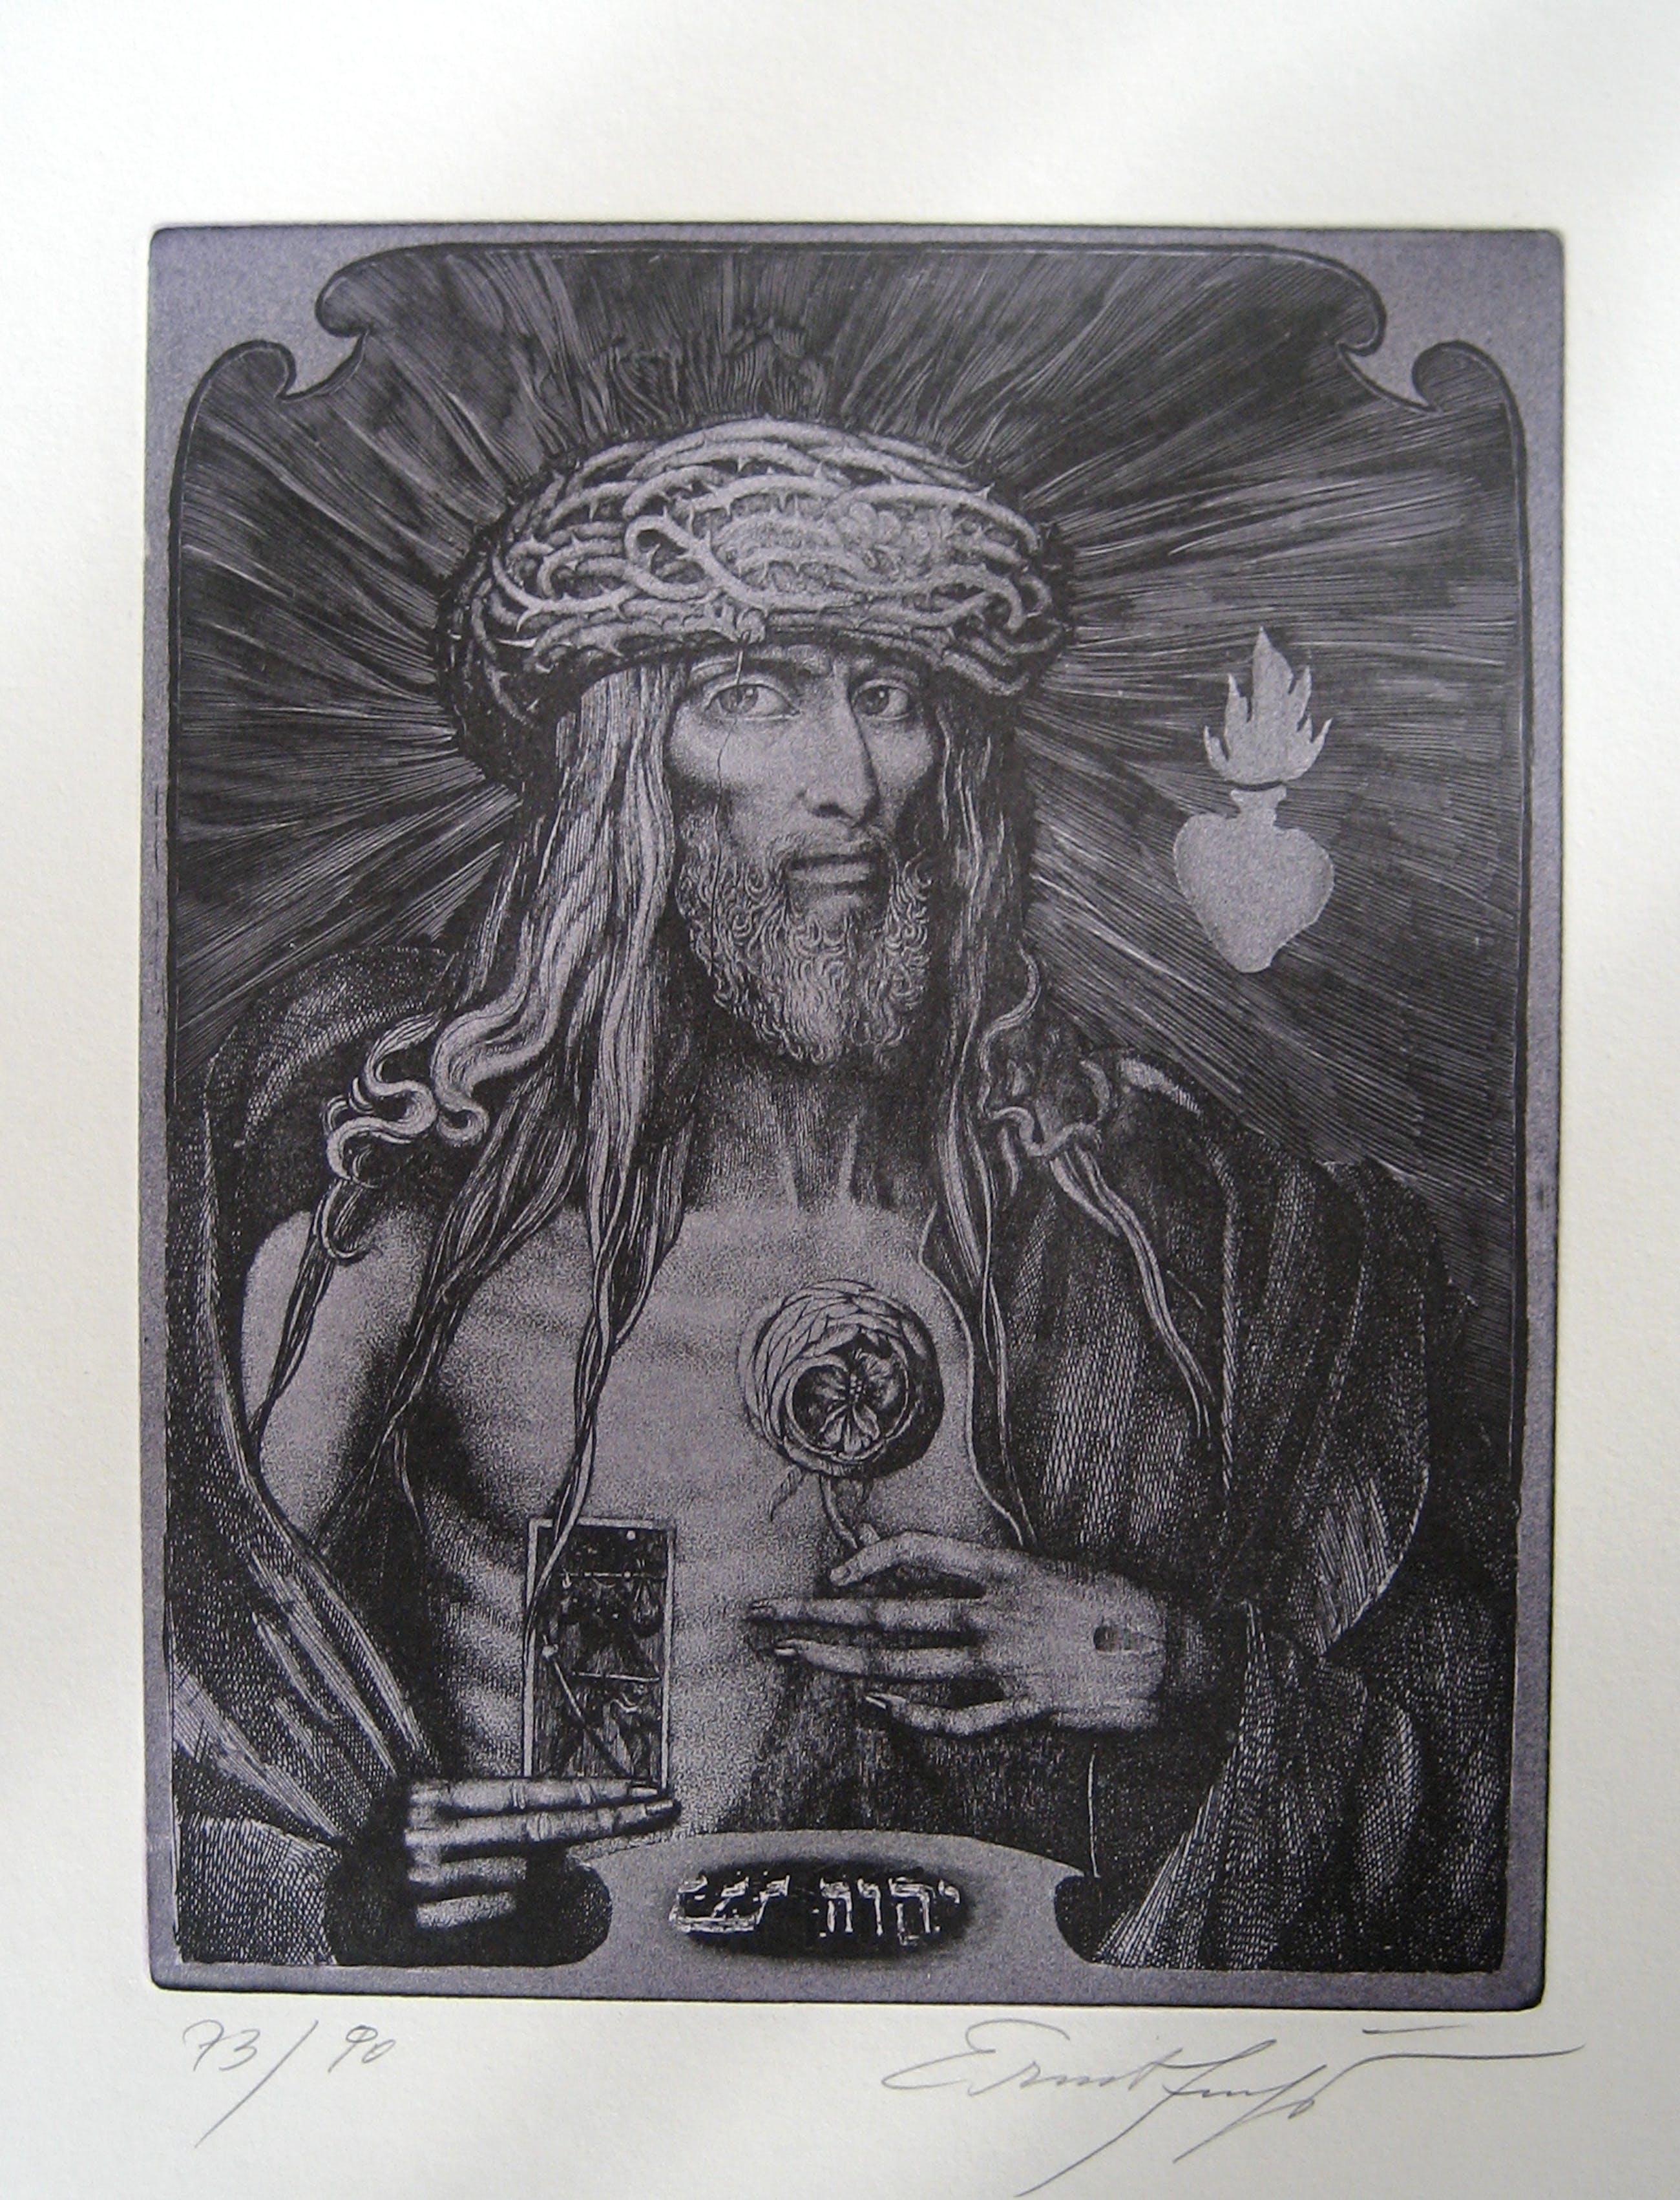 Ernst Fuchs - Ernst Fuchs - Ets uit 1975 - 'Christ König'-nr. 73/90 kopen? Bied vanaf 125!